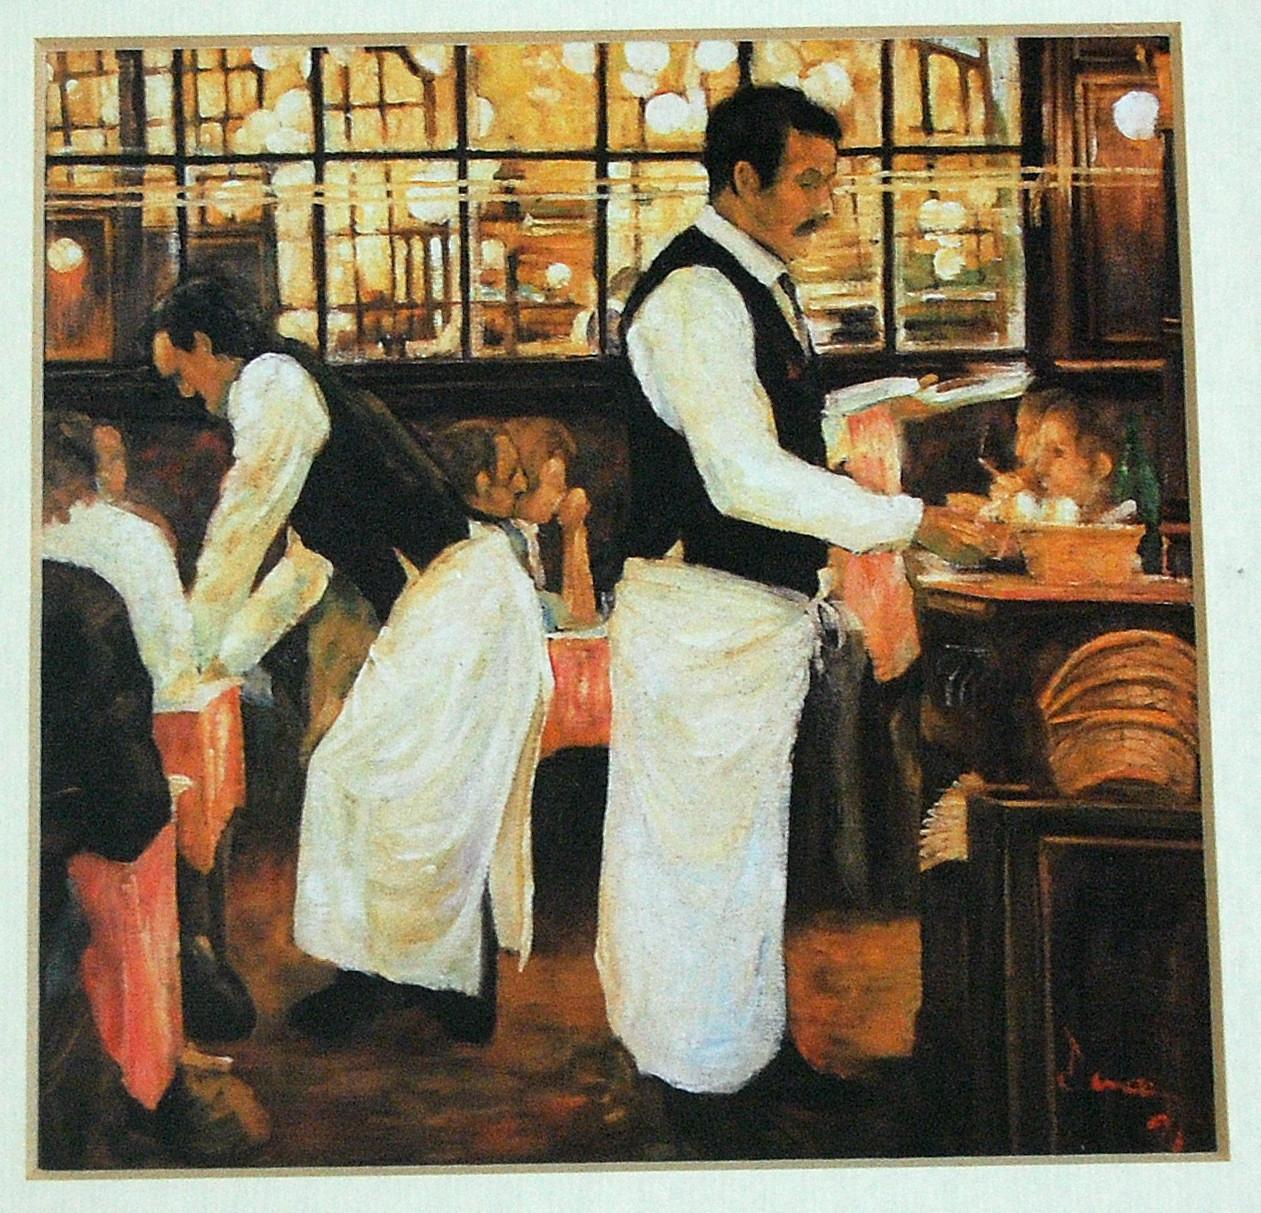 chartier restaurant paris 9